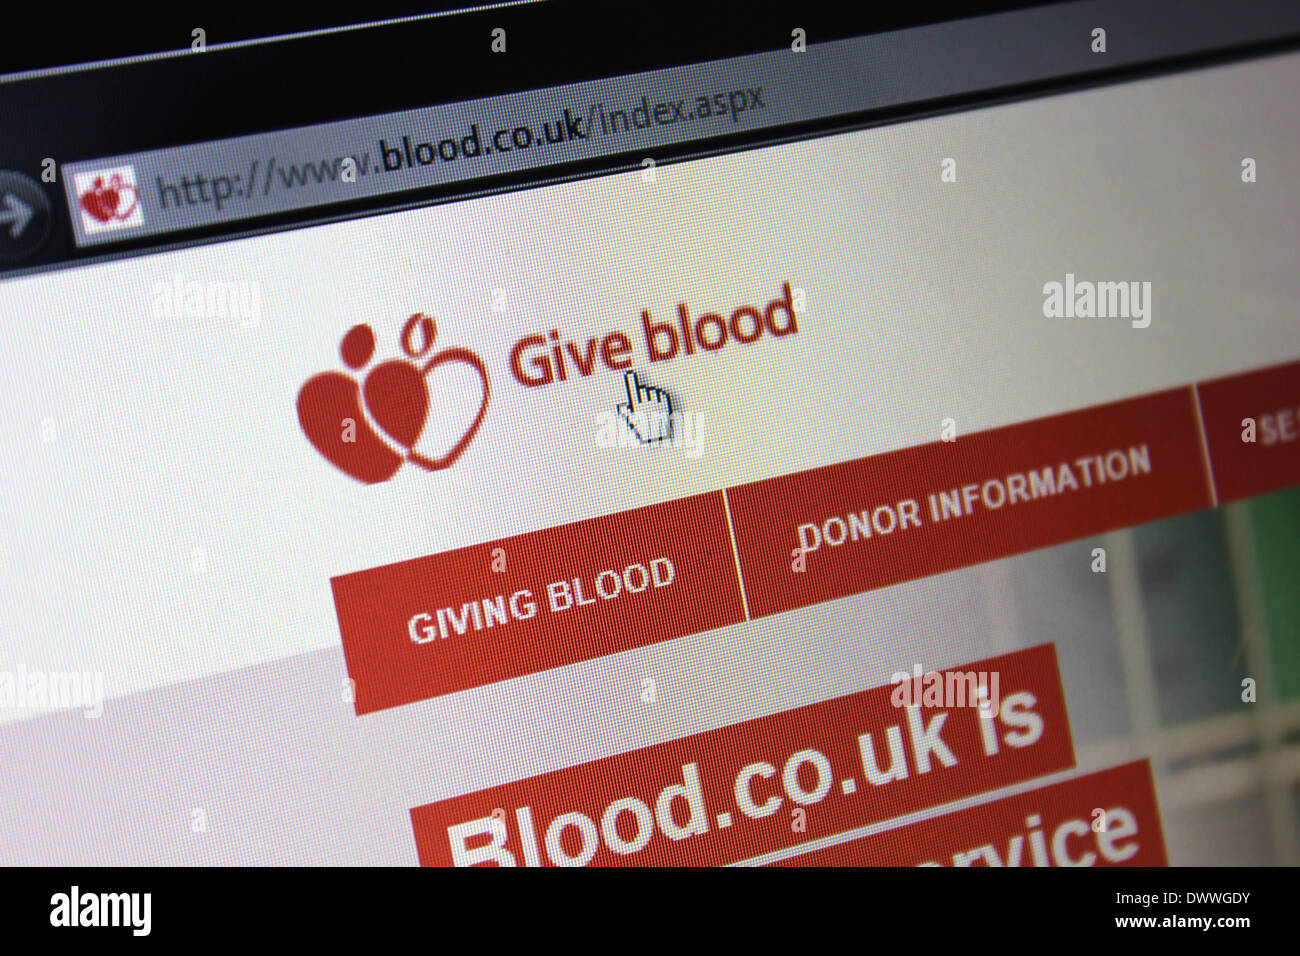 Blood donation website - Stock Image